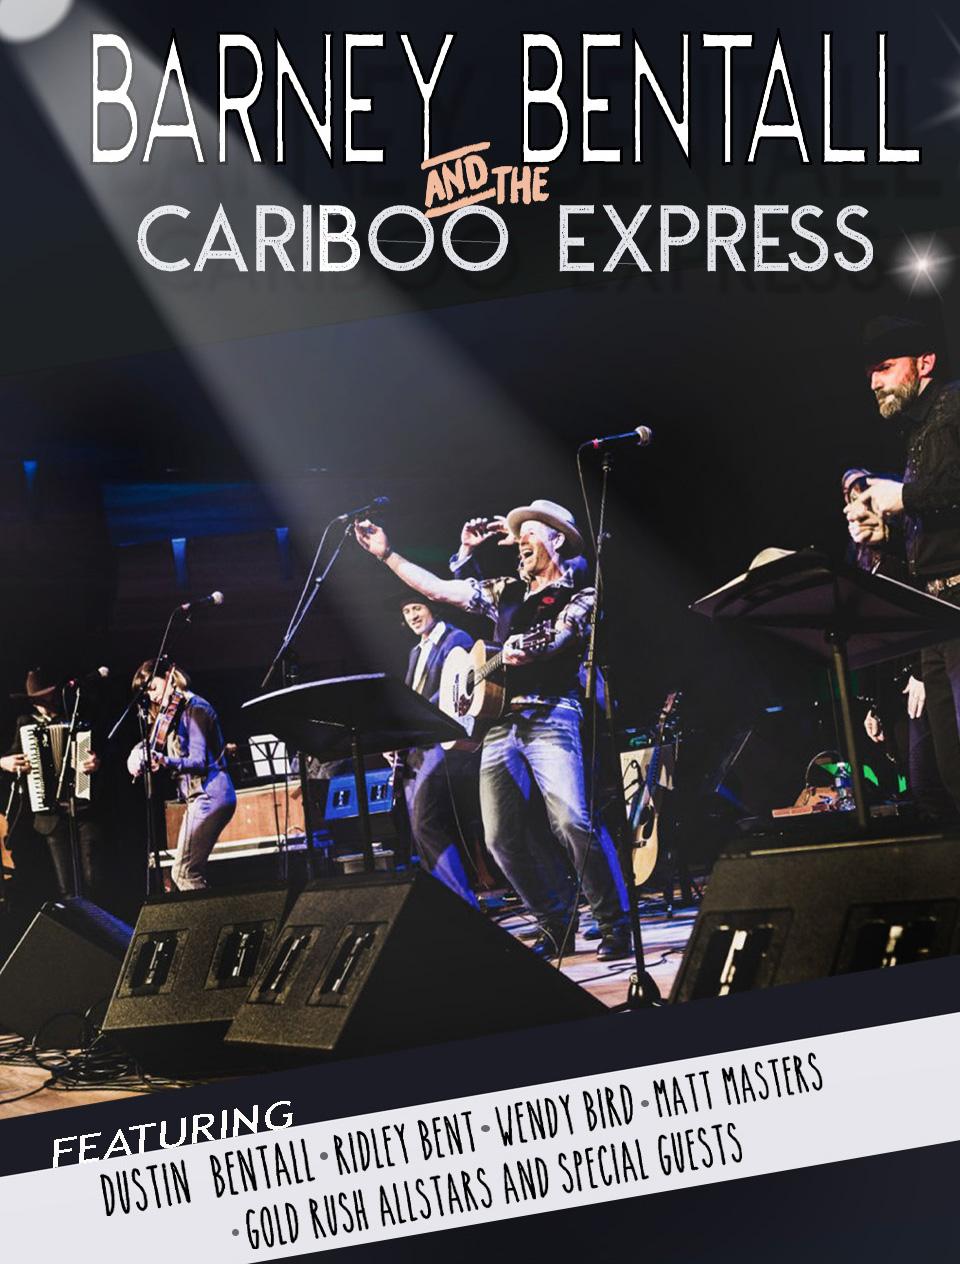 Barney Bentall & The Cariboo Express 2019